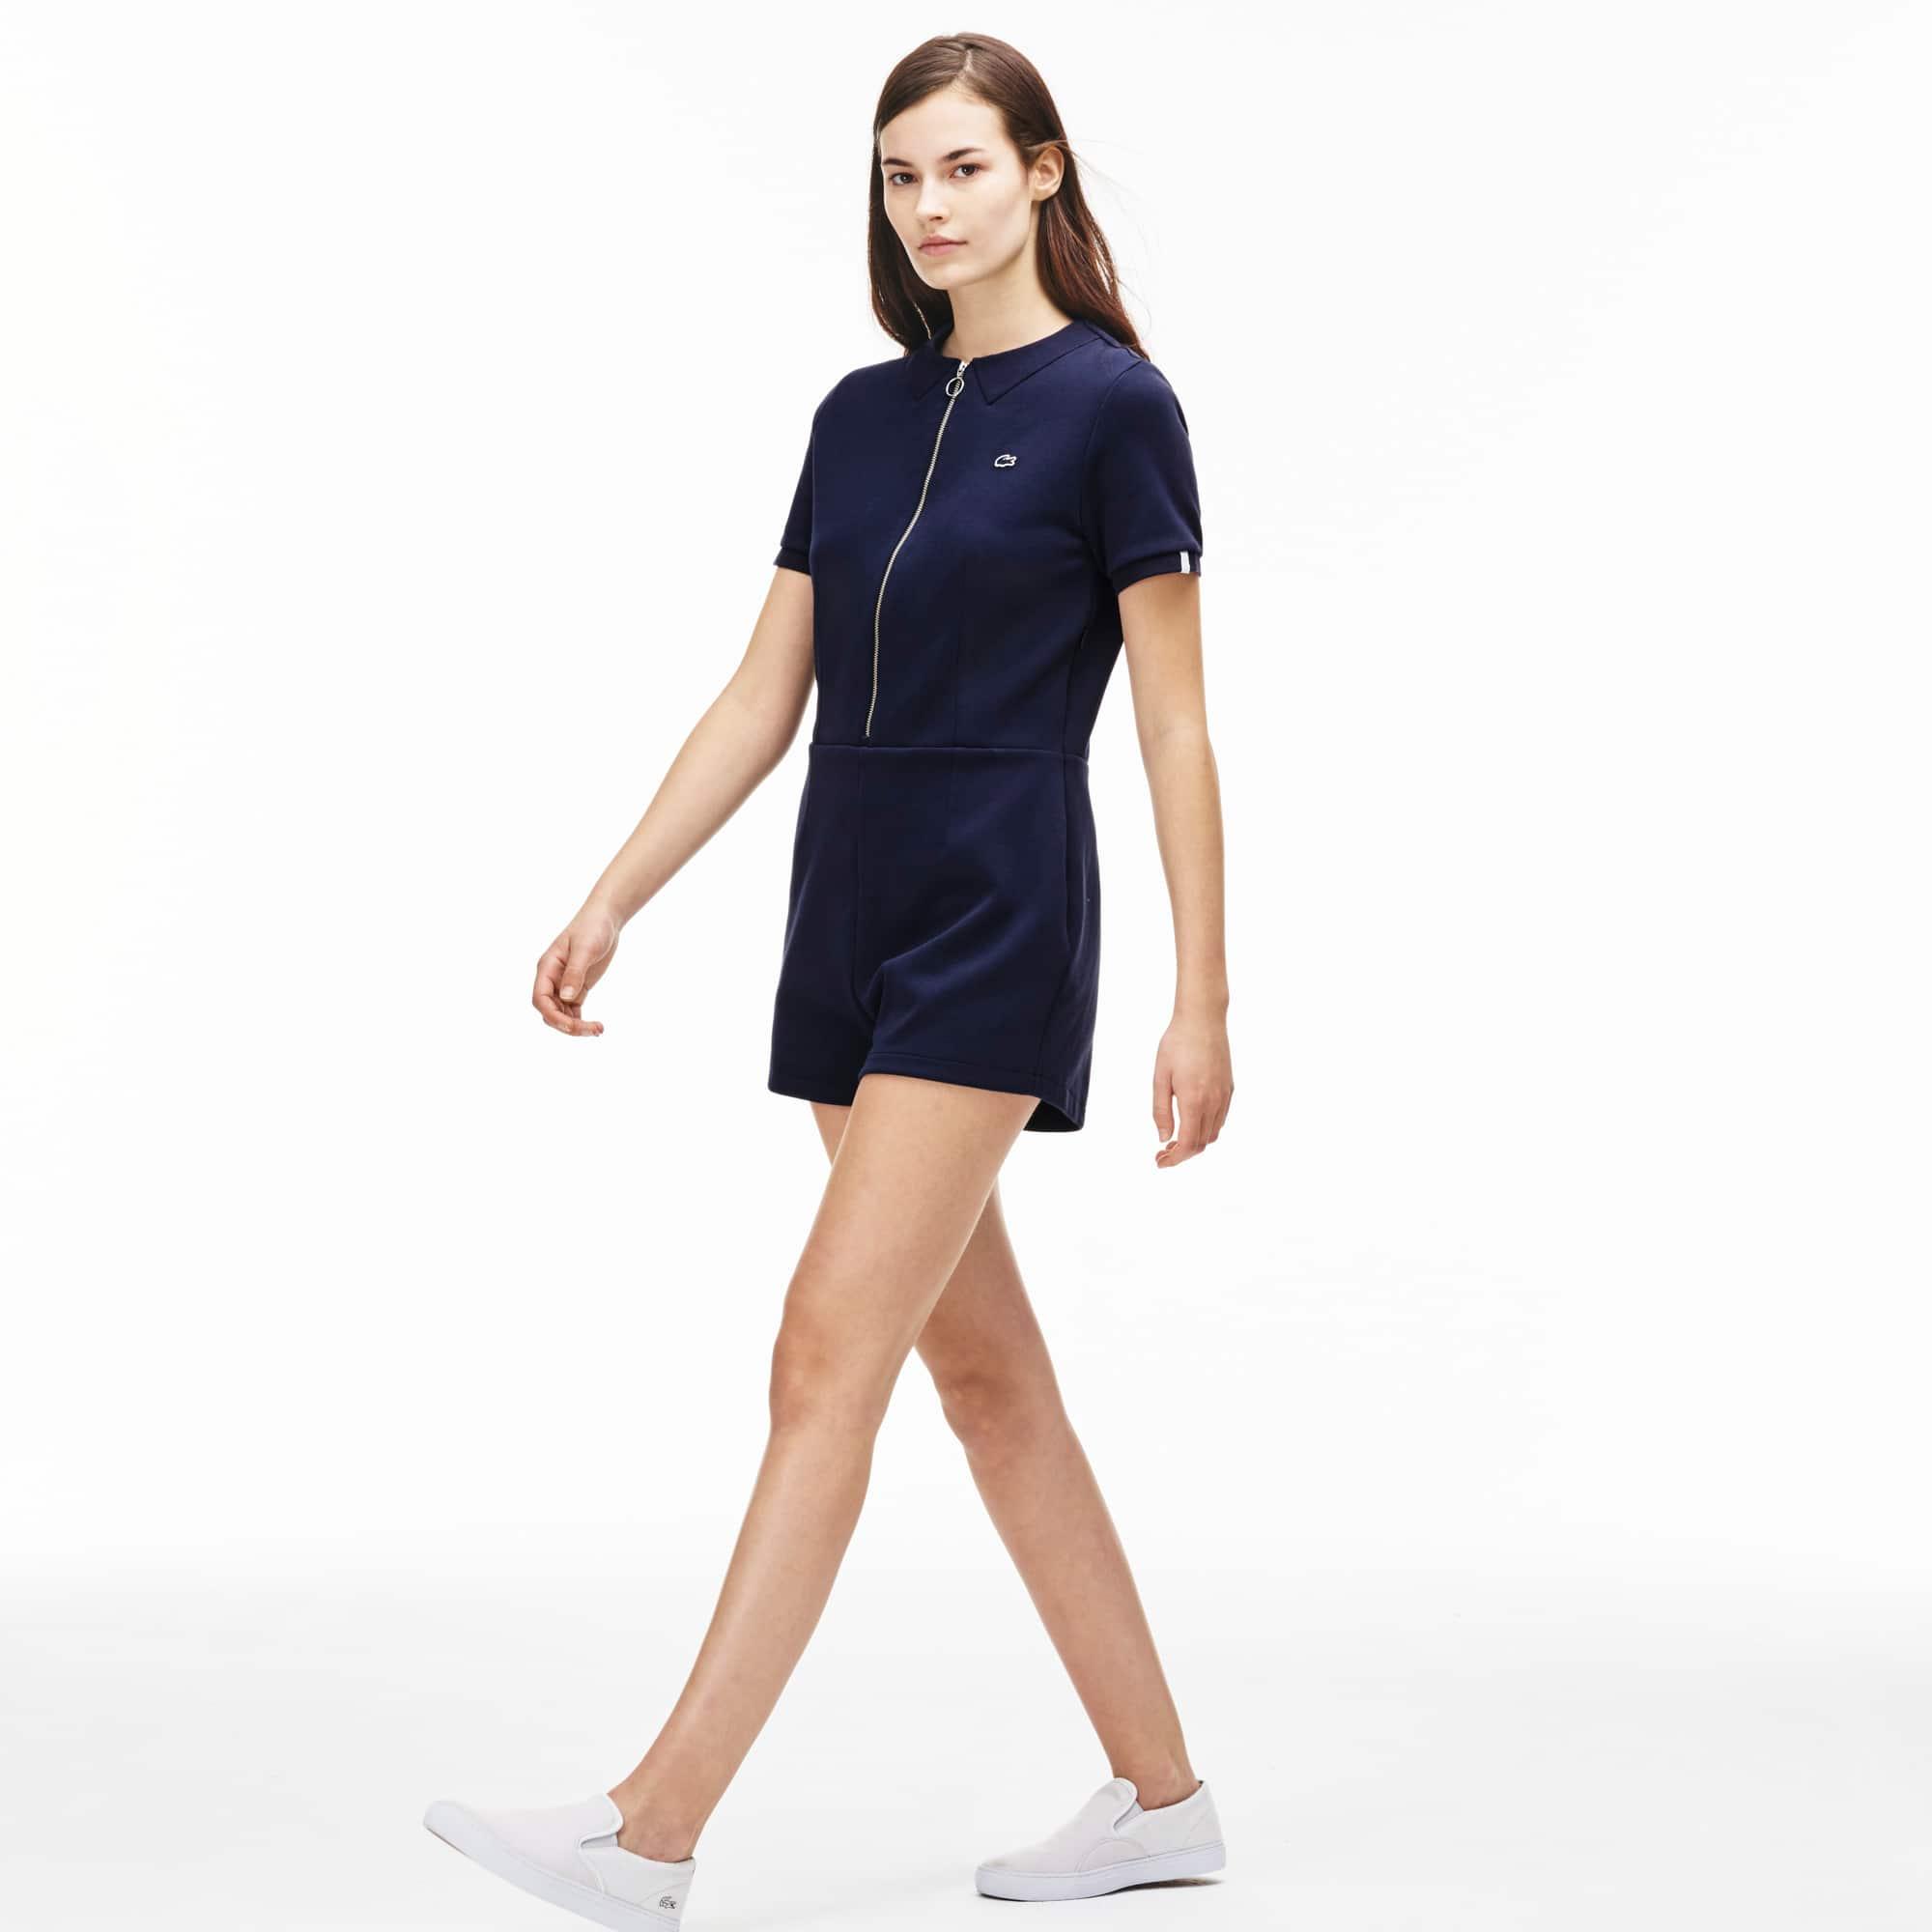 Women's L!VE Stretch Cotton Zippered Playsuit